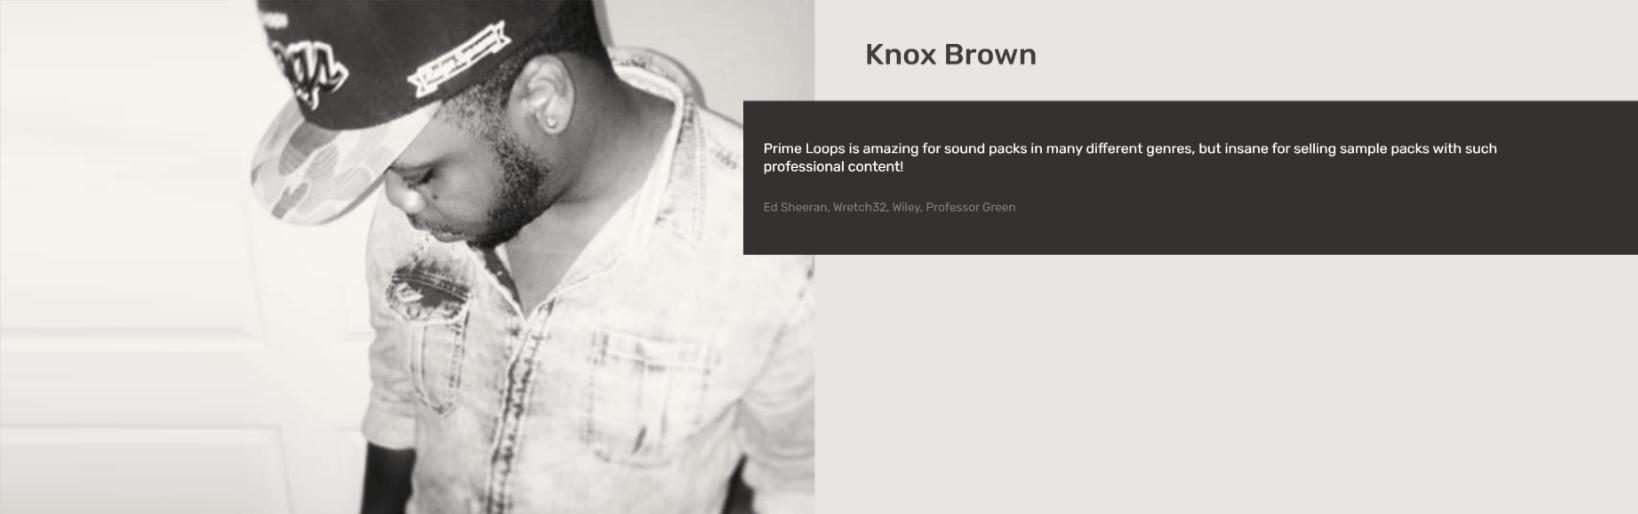 Knox Brown  Testimonial